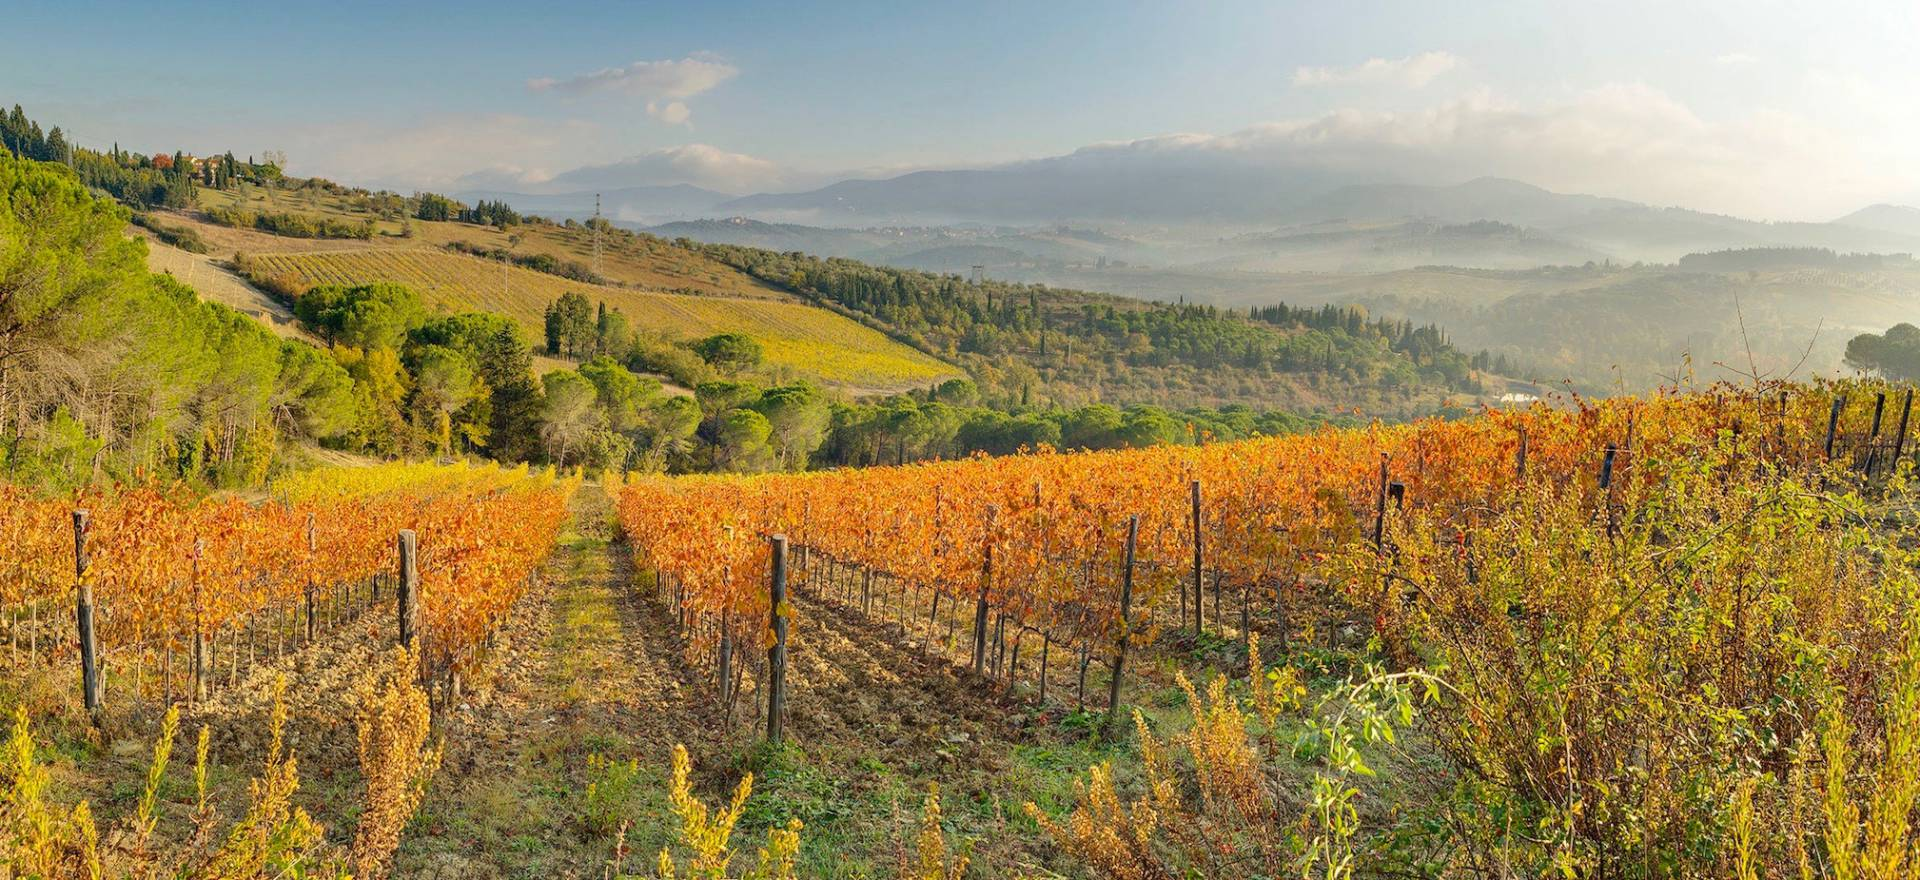 Agriturismo Toscana Agriturismo tra vigneti vicino a Firenze, Toscana